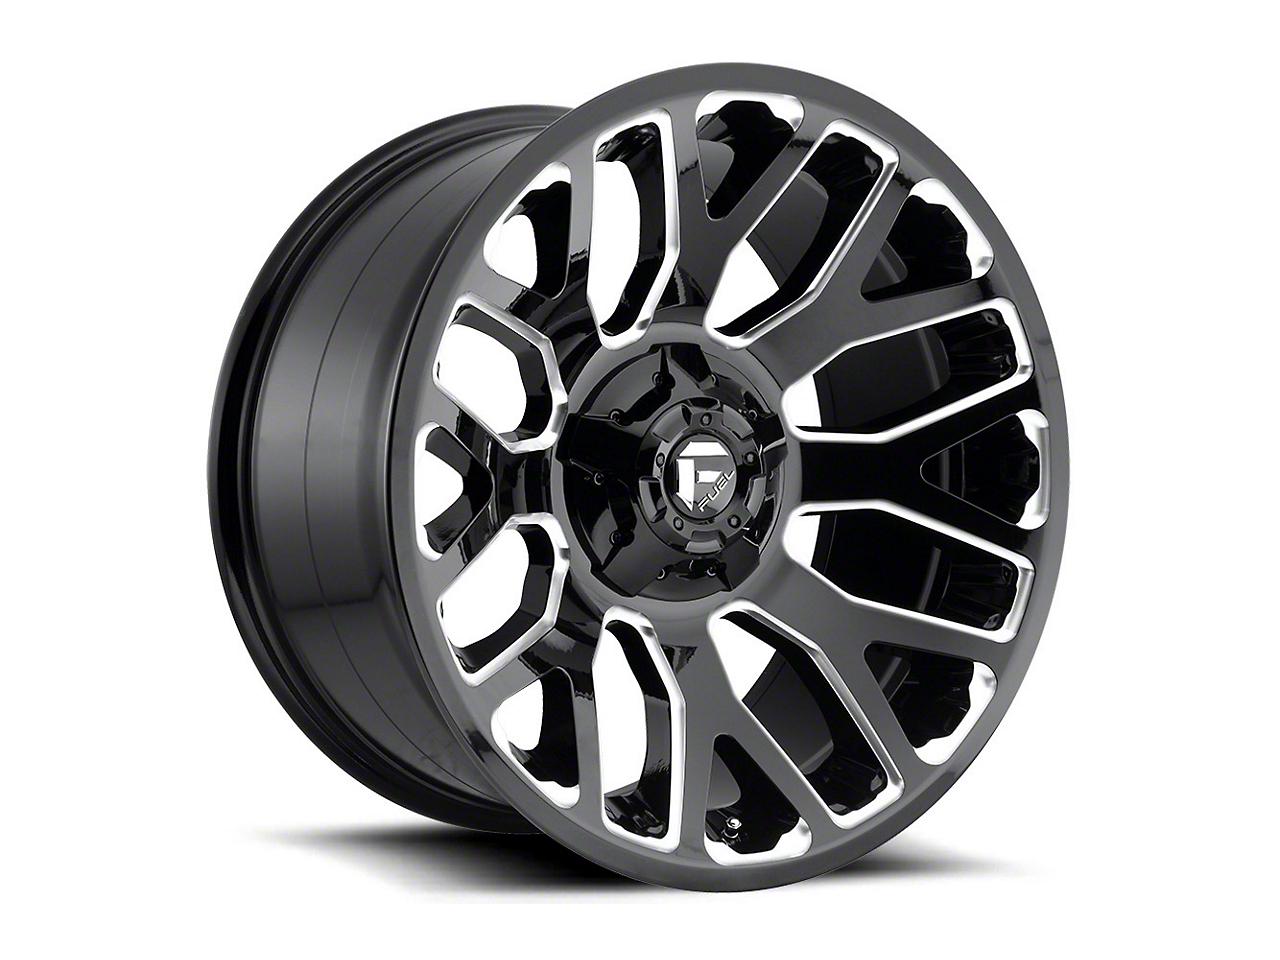 Fuel Wheels Titan II Gloss Black Milled 6-Lug Wheel - 20x10 (99-18 Silverado 1500)